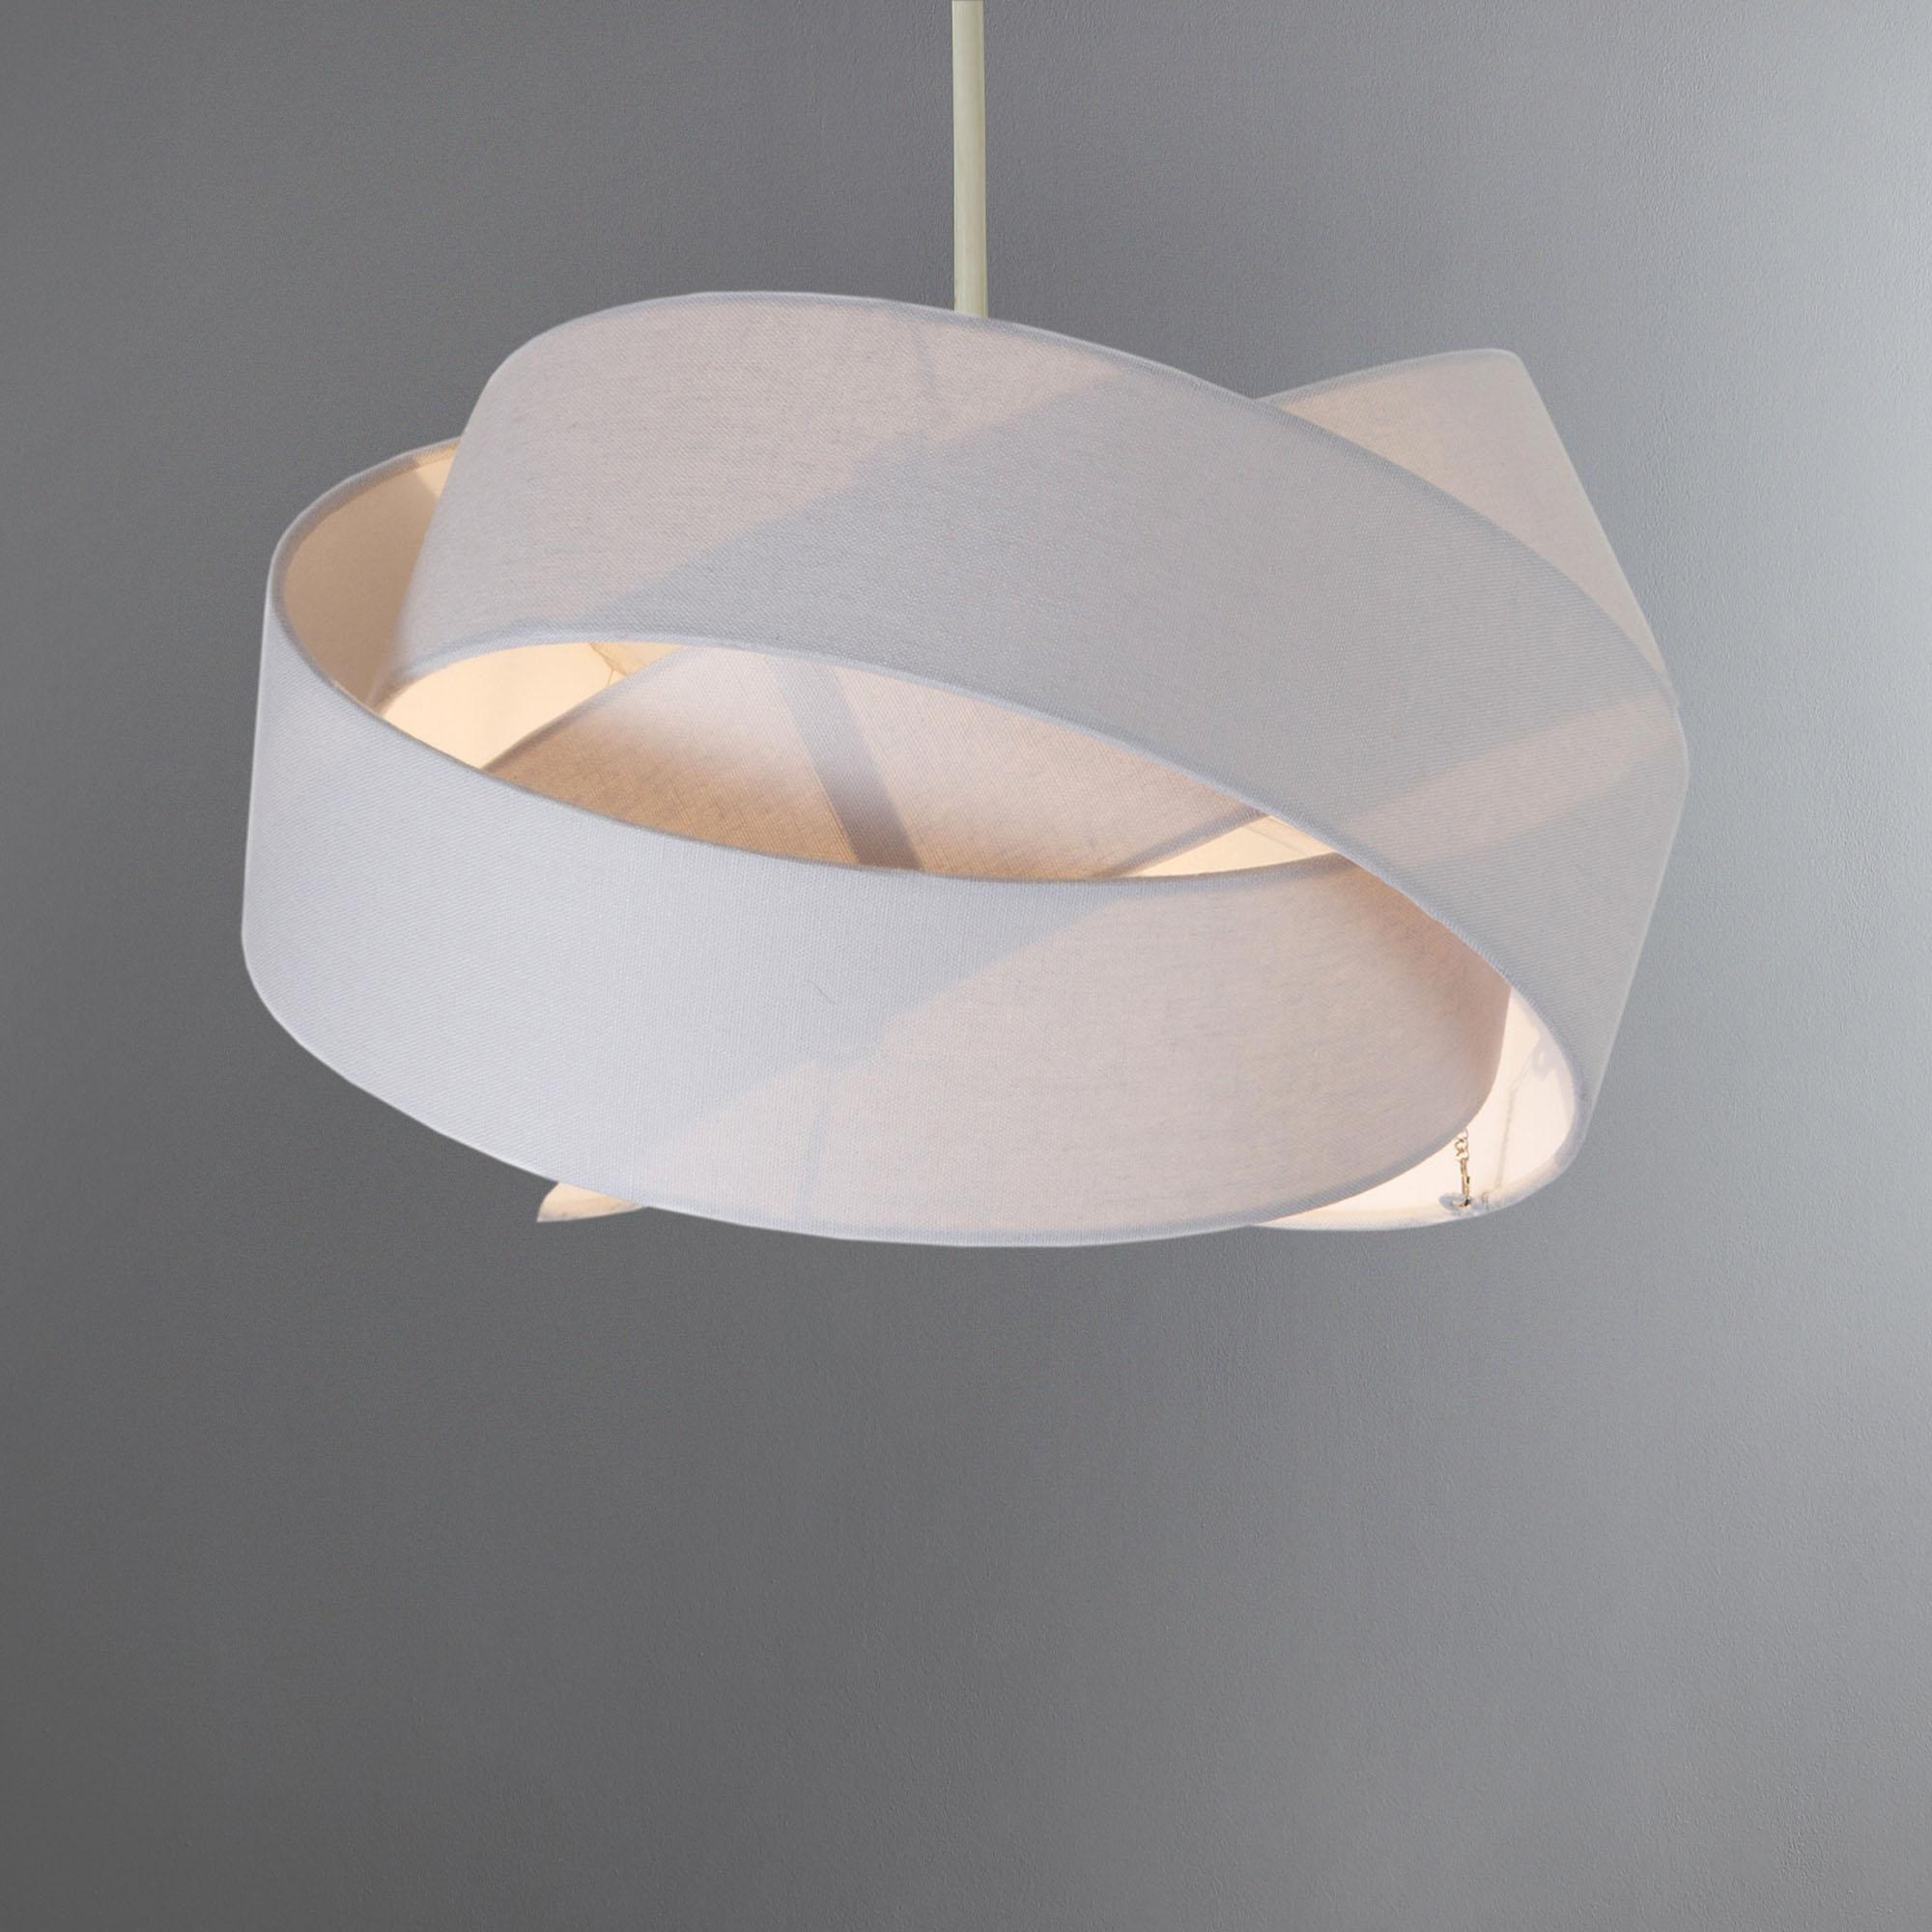 Light Shades Get The Best Bedroom Ceiling Light Ceiling Lights